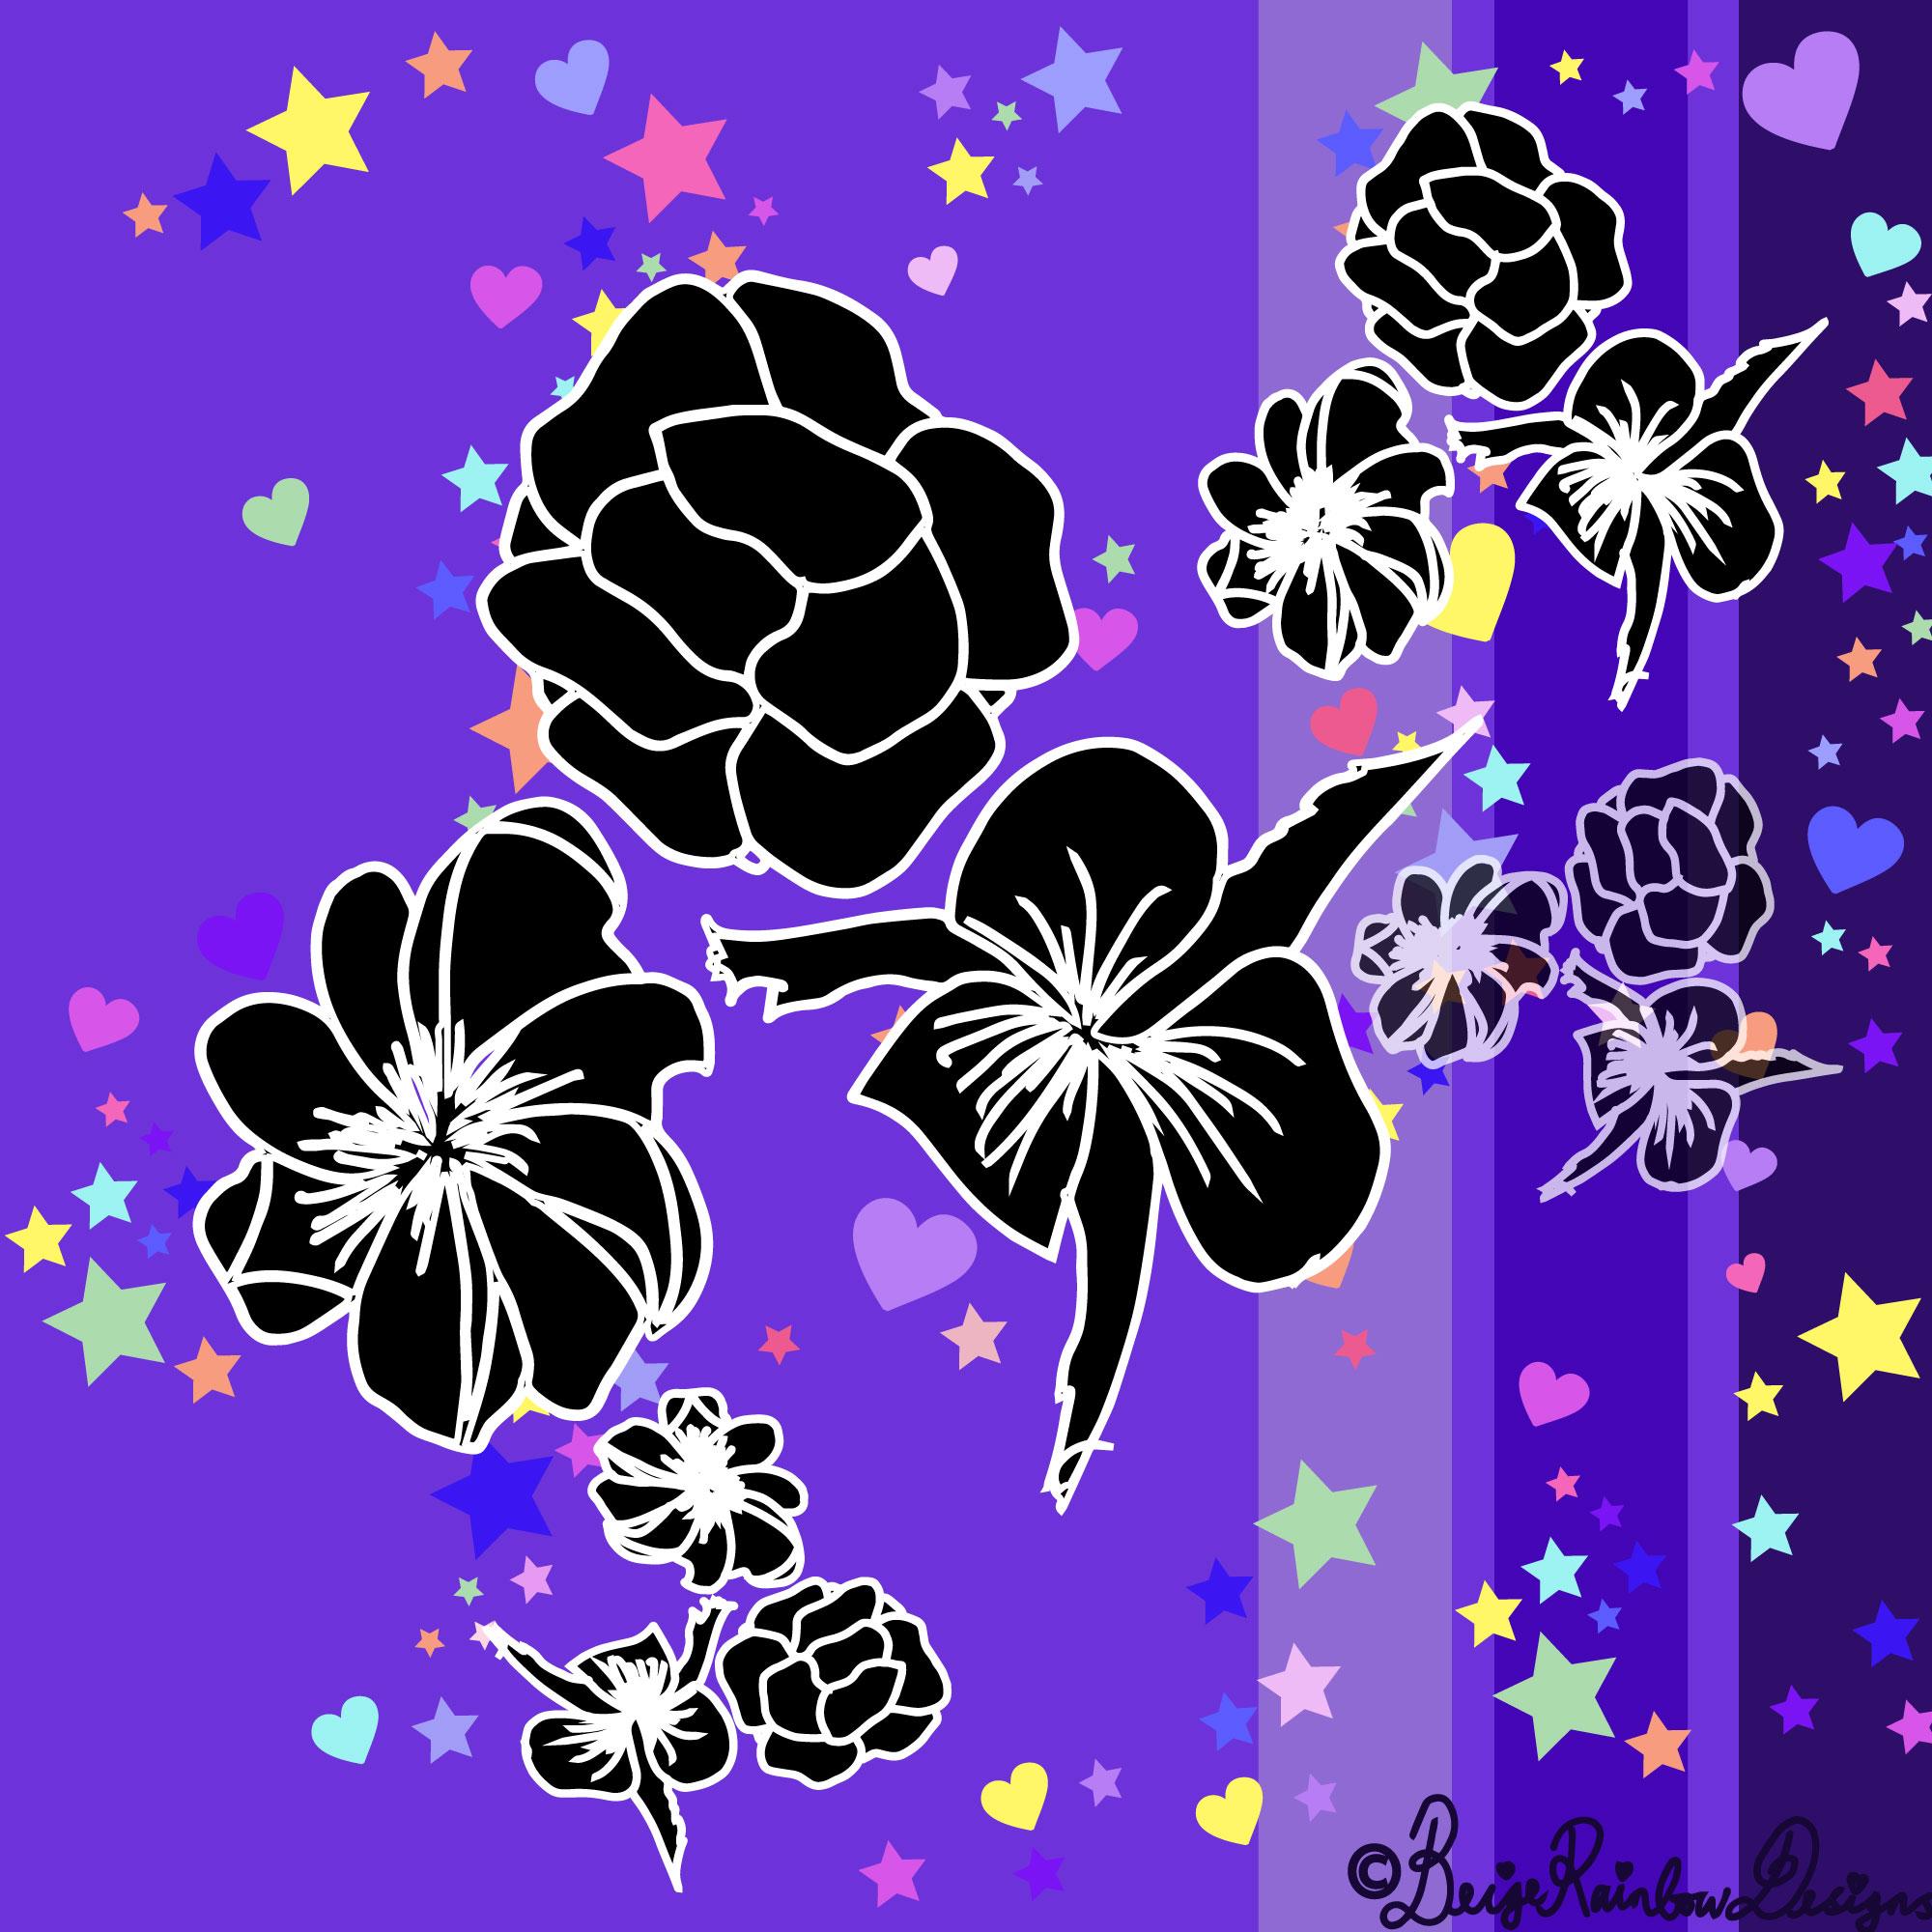 Flowers-and-stars-for-webby.jpg